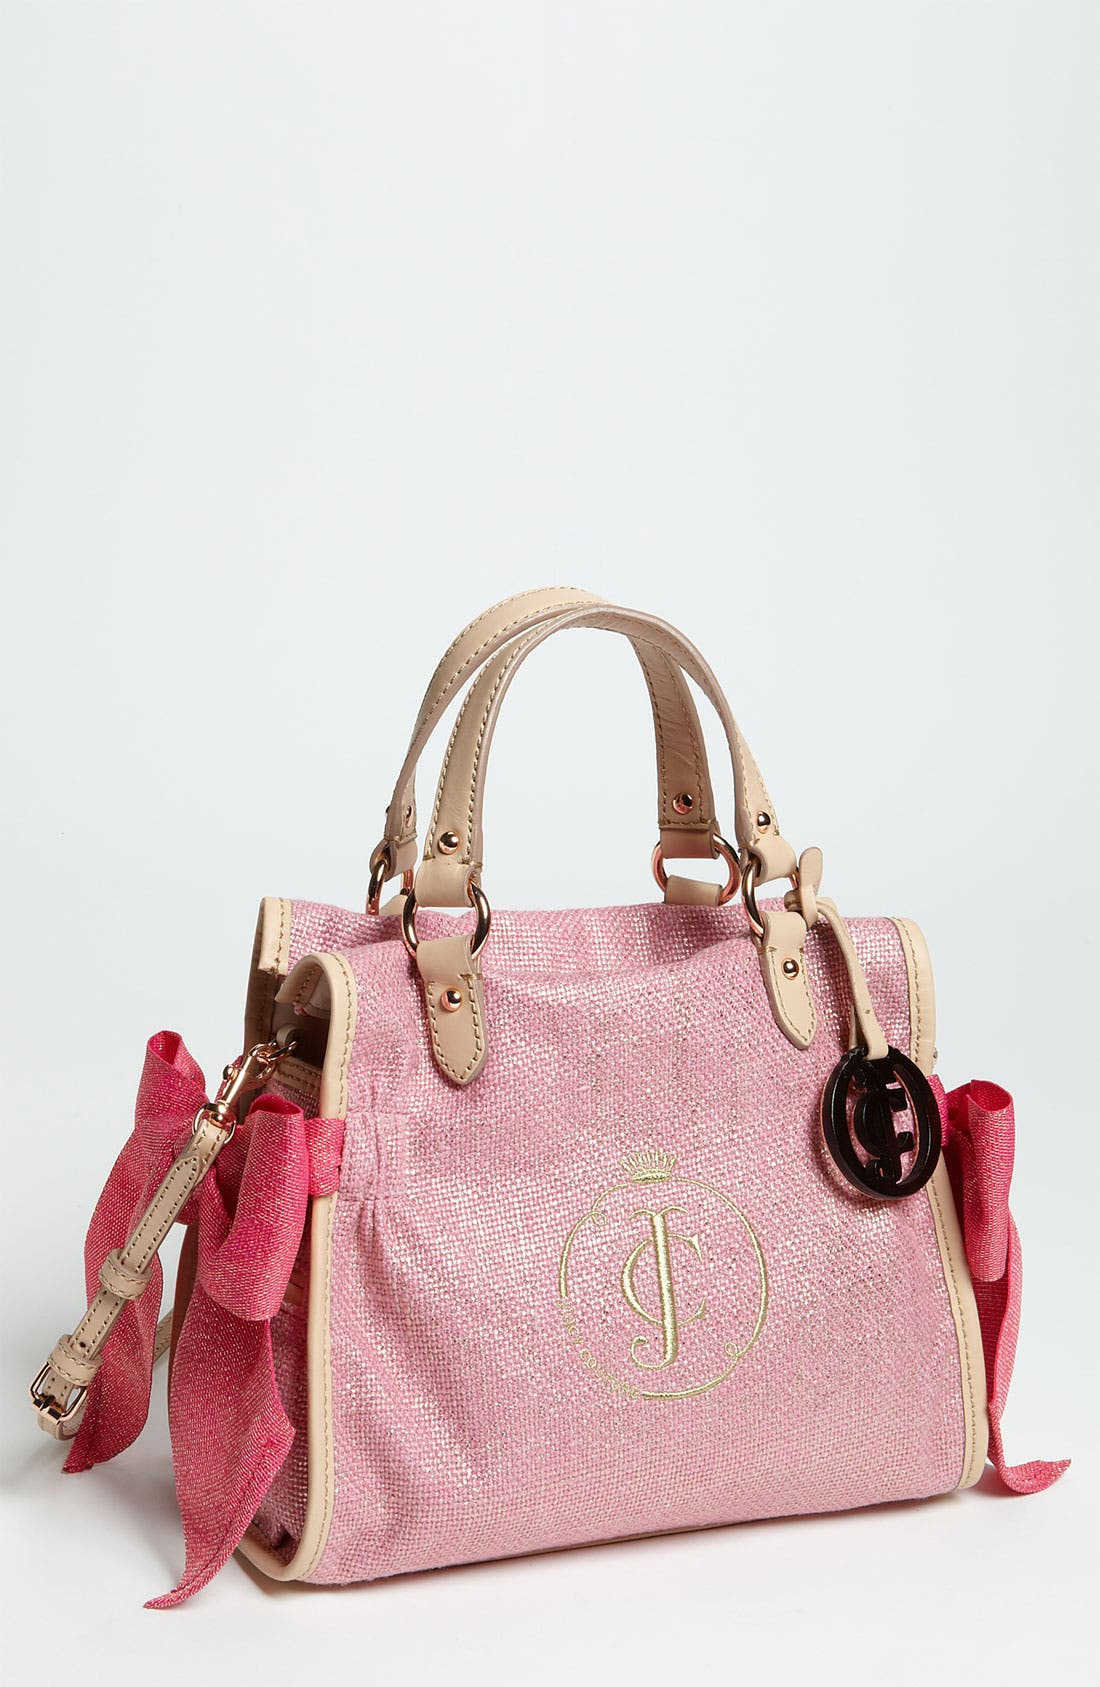 Main Image - Juicy Couture 'Miss Daydreamer' Handbag